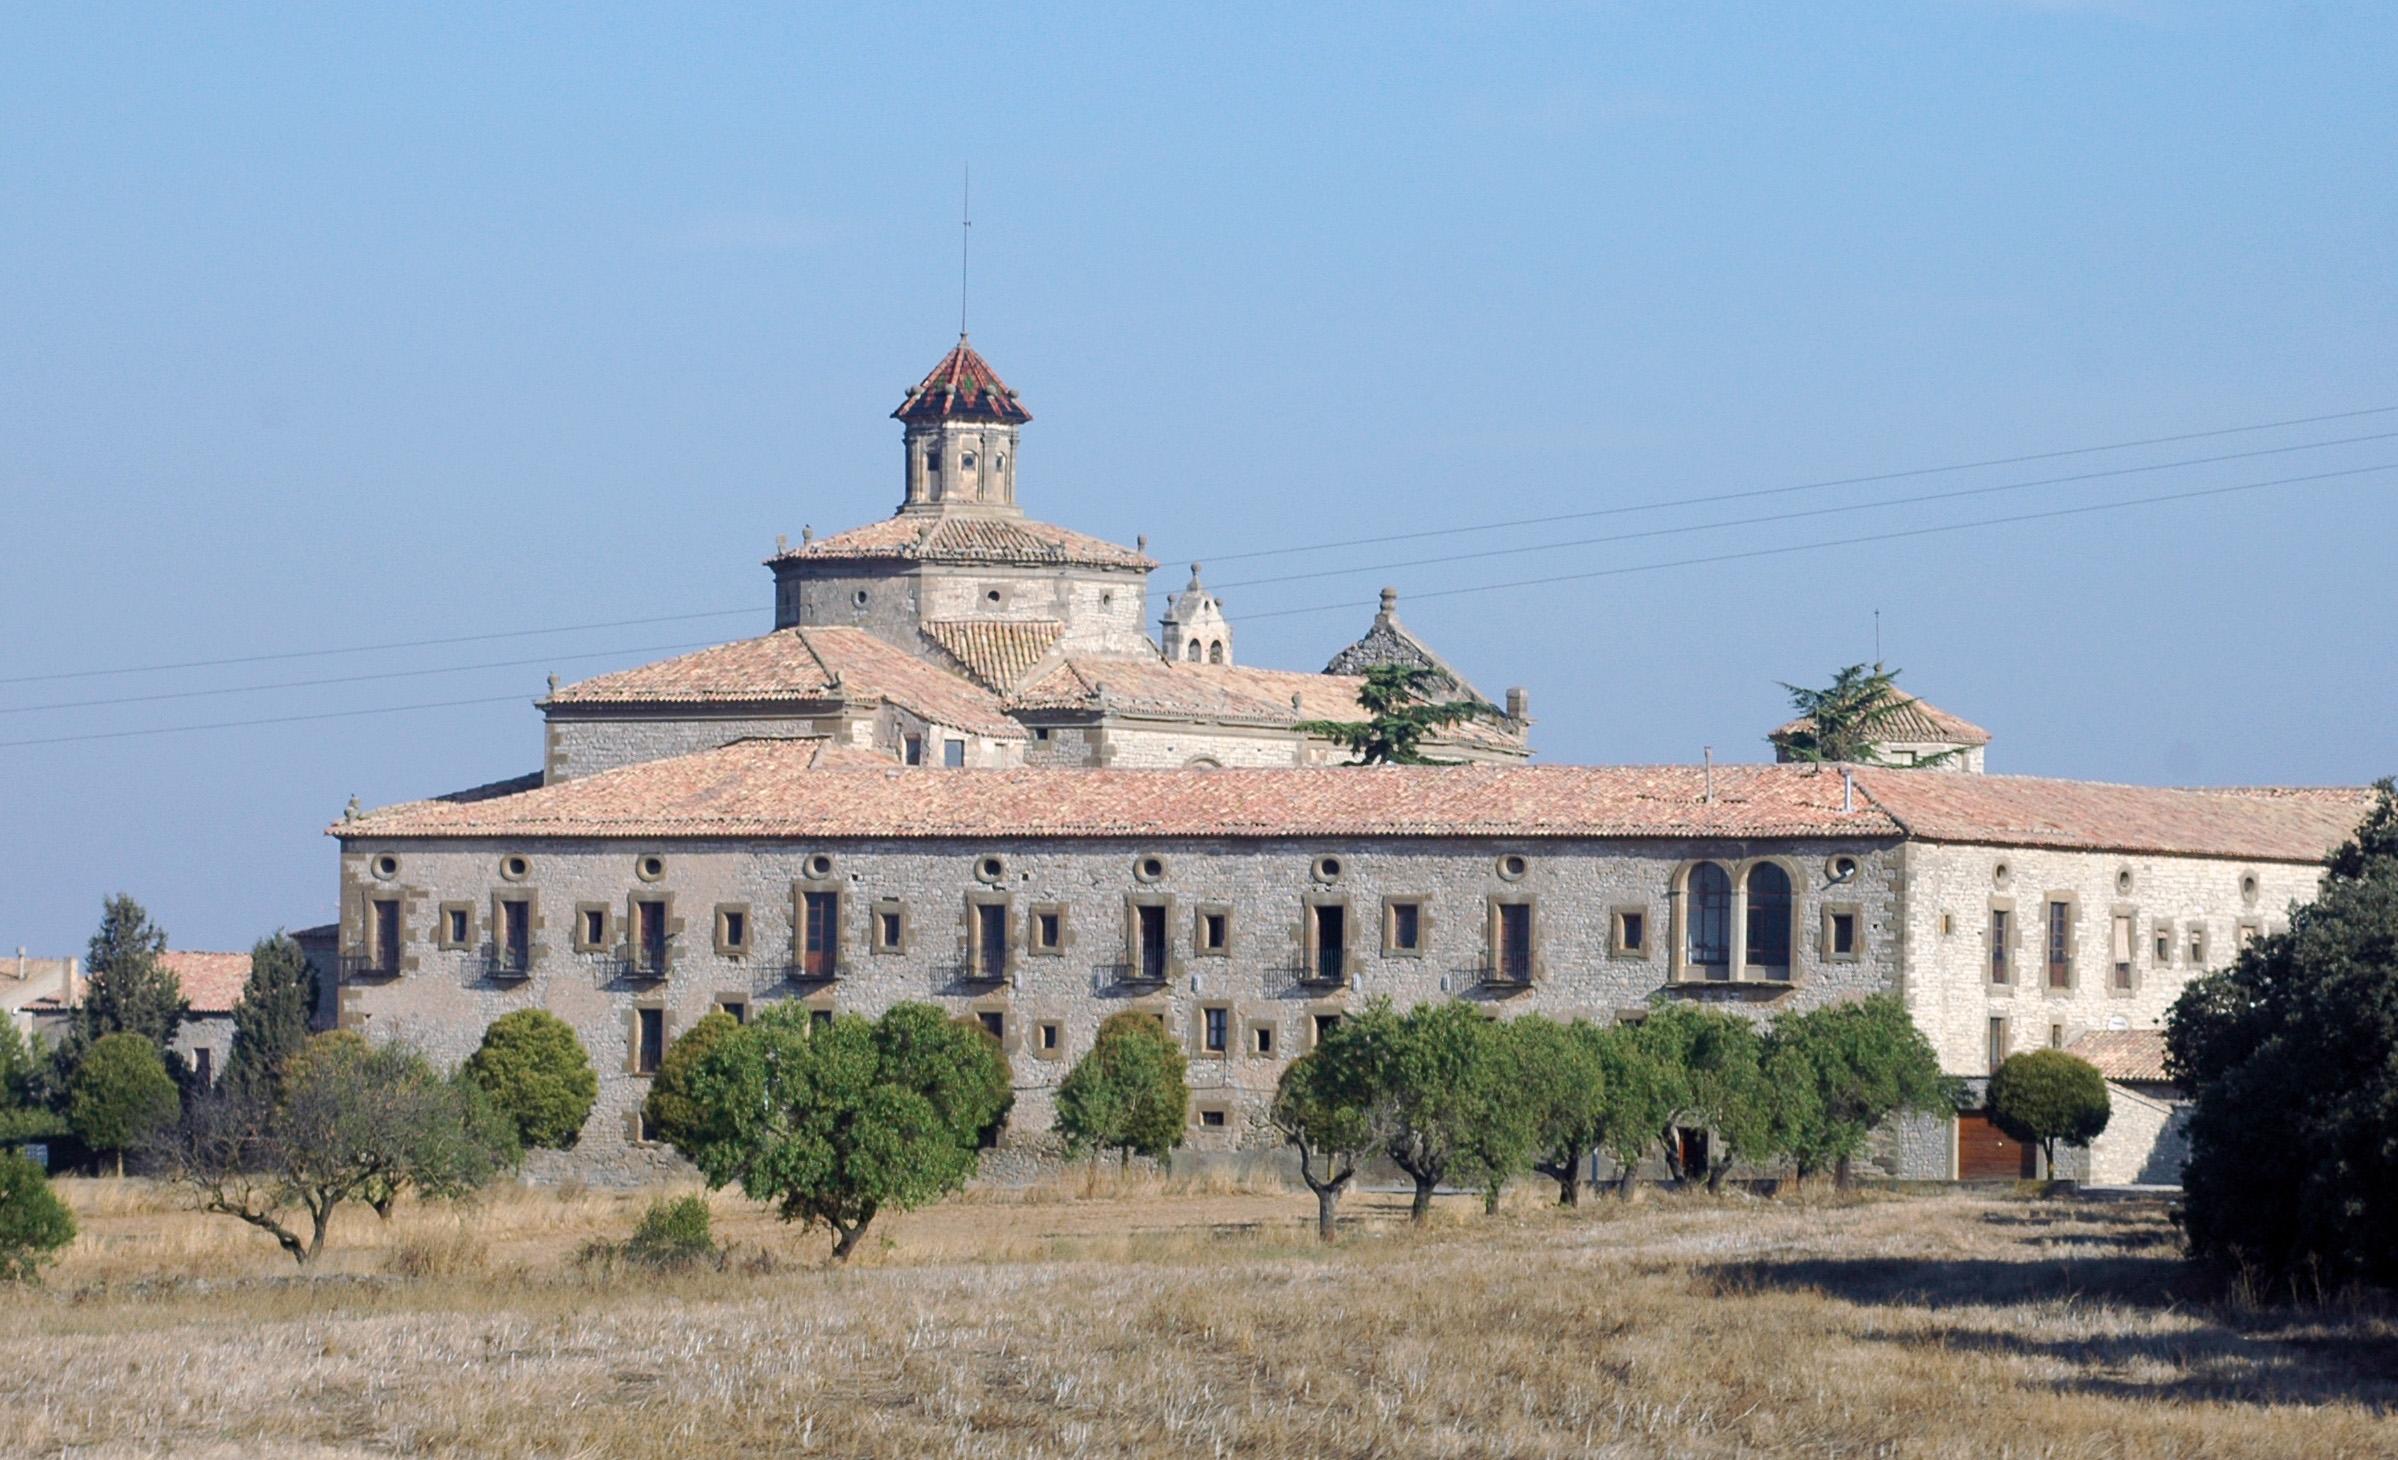 Monestir Santuari de Sant Ramon Nonat